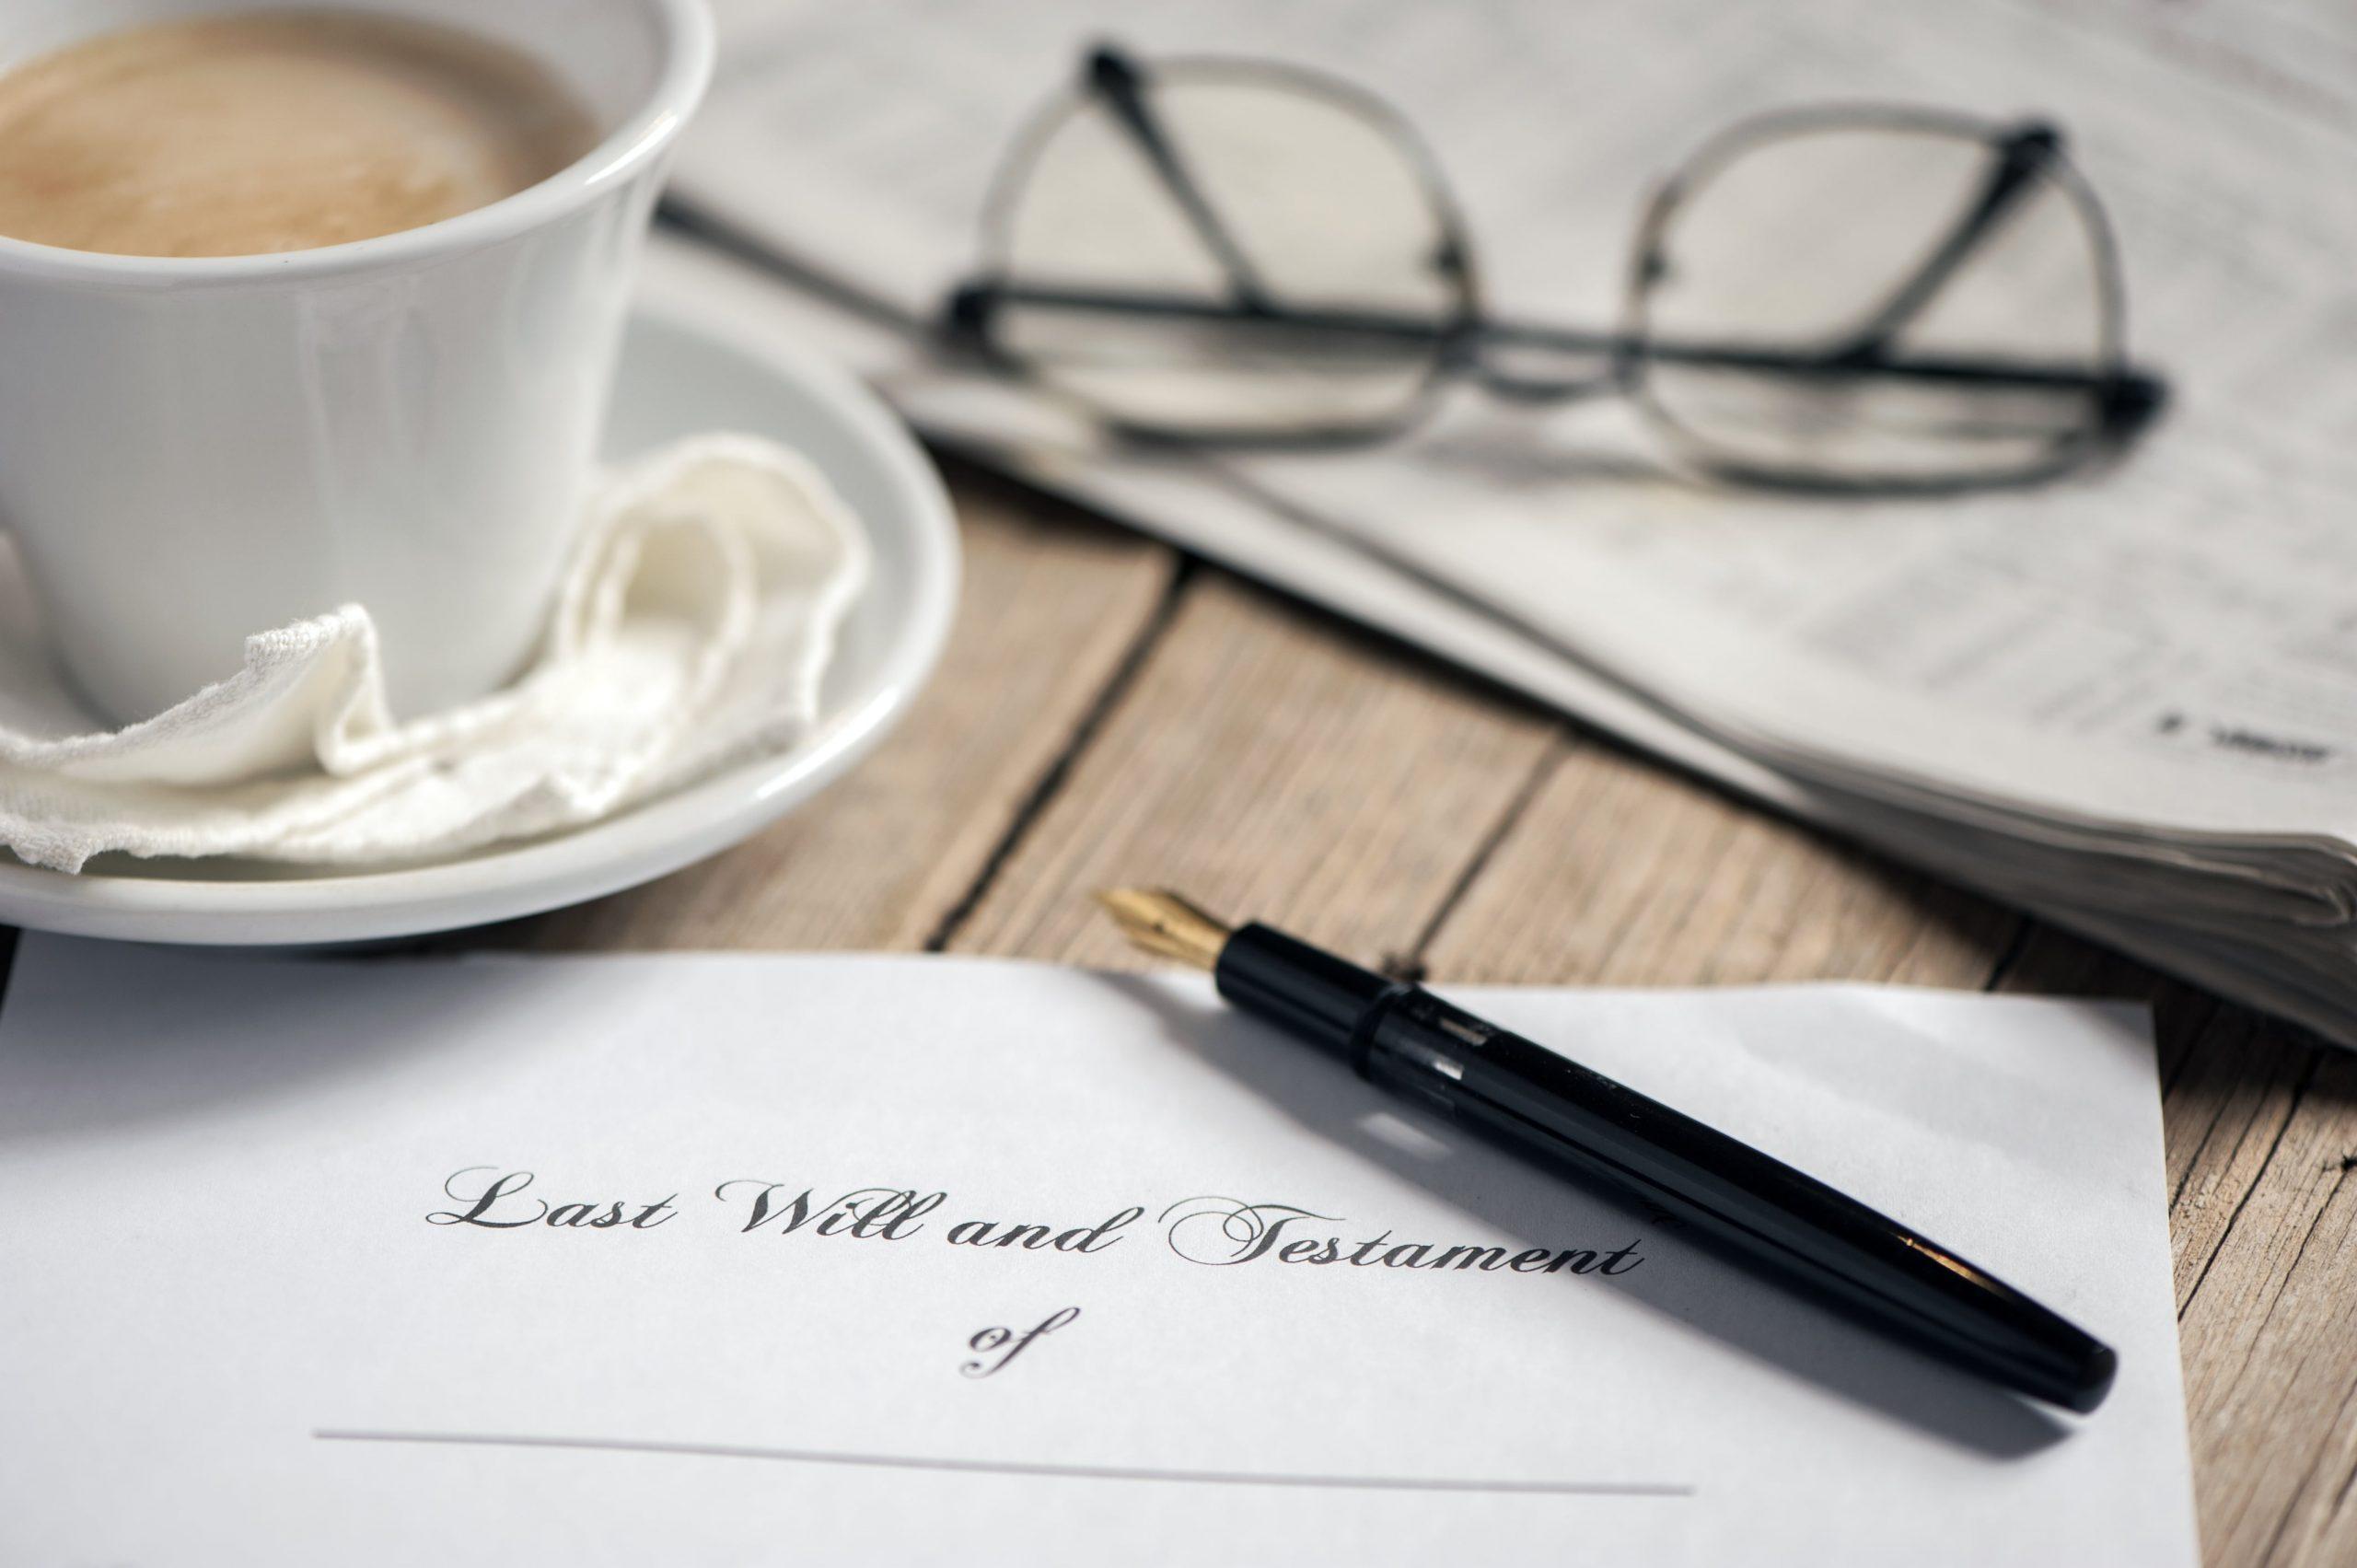 Folded legal will sitting on table near coffee mug, pen, and eyeglasses